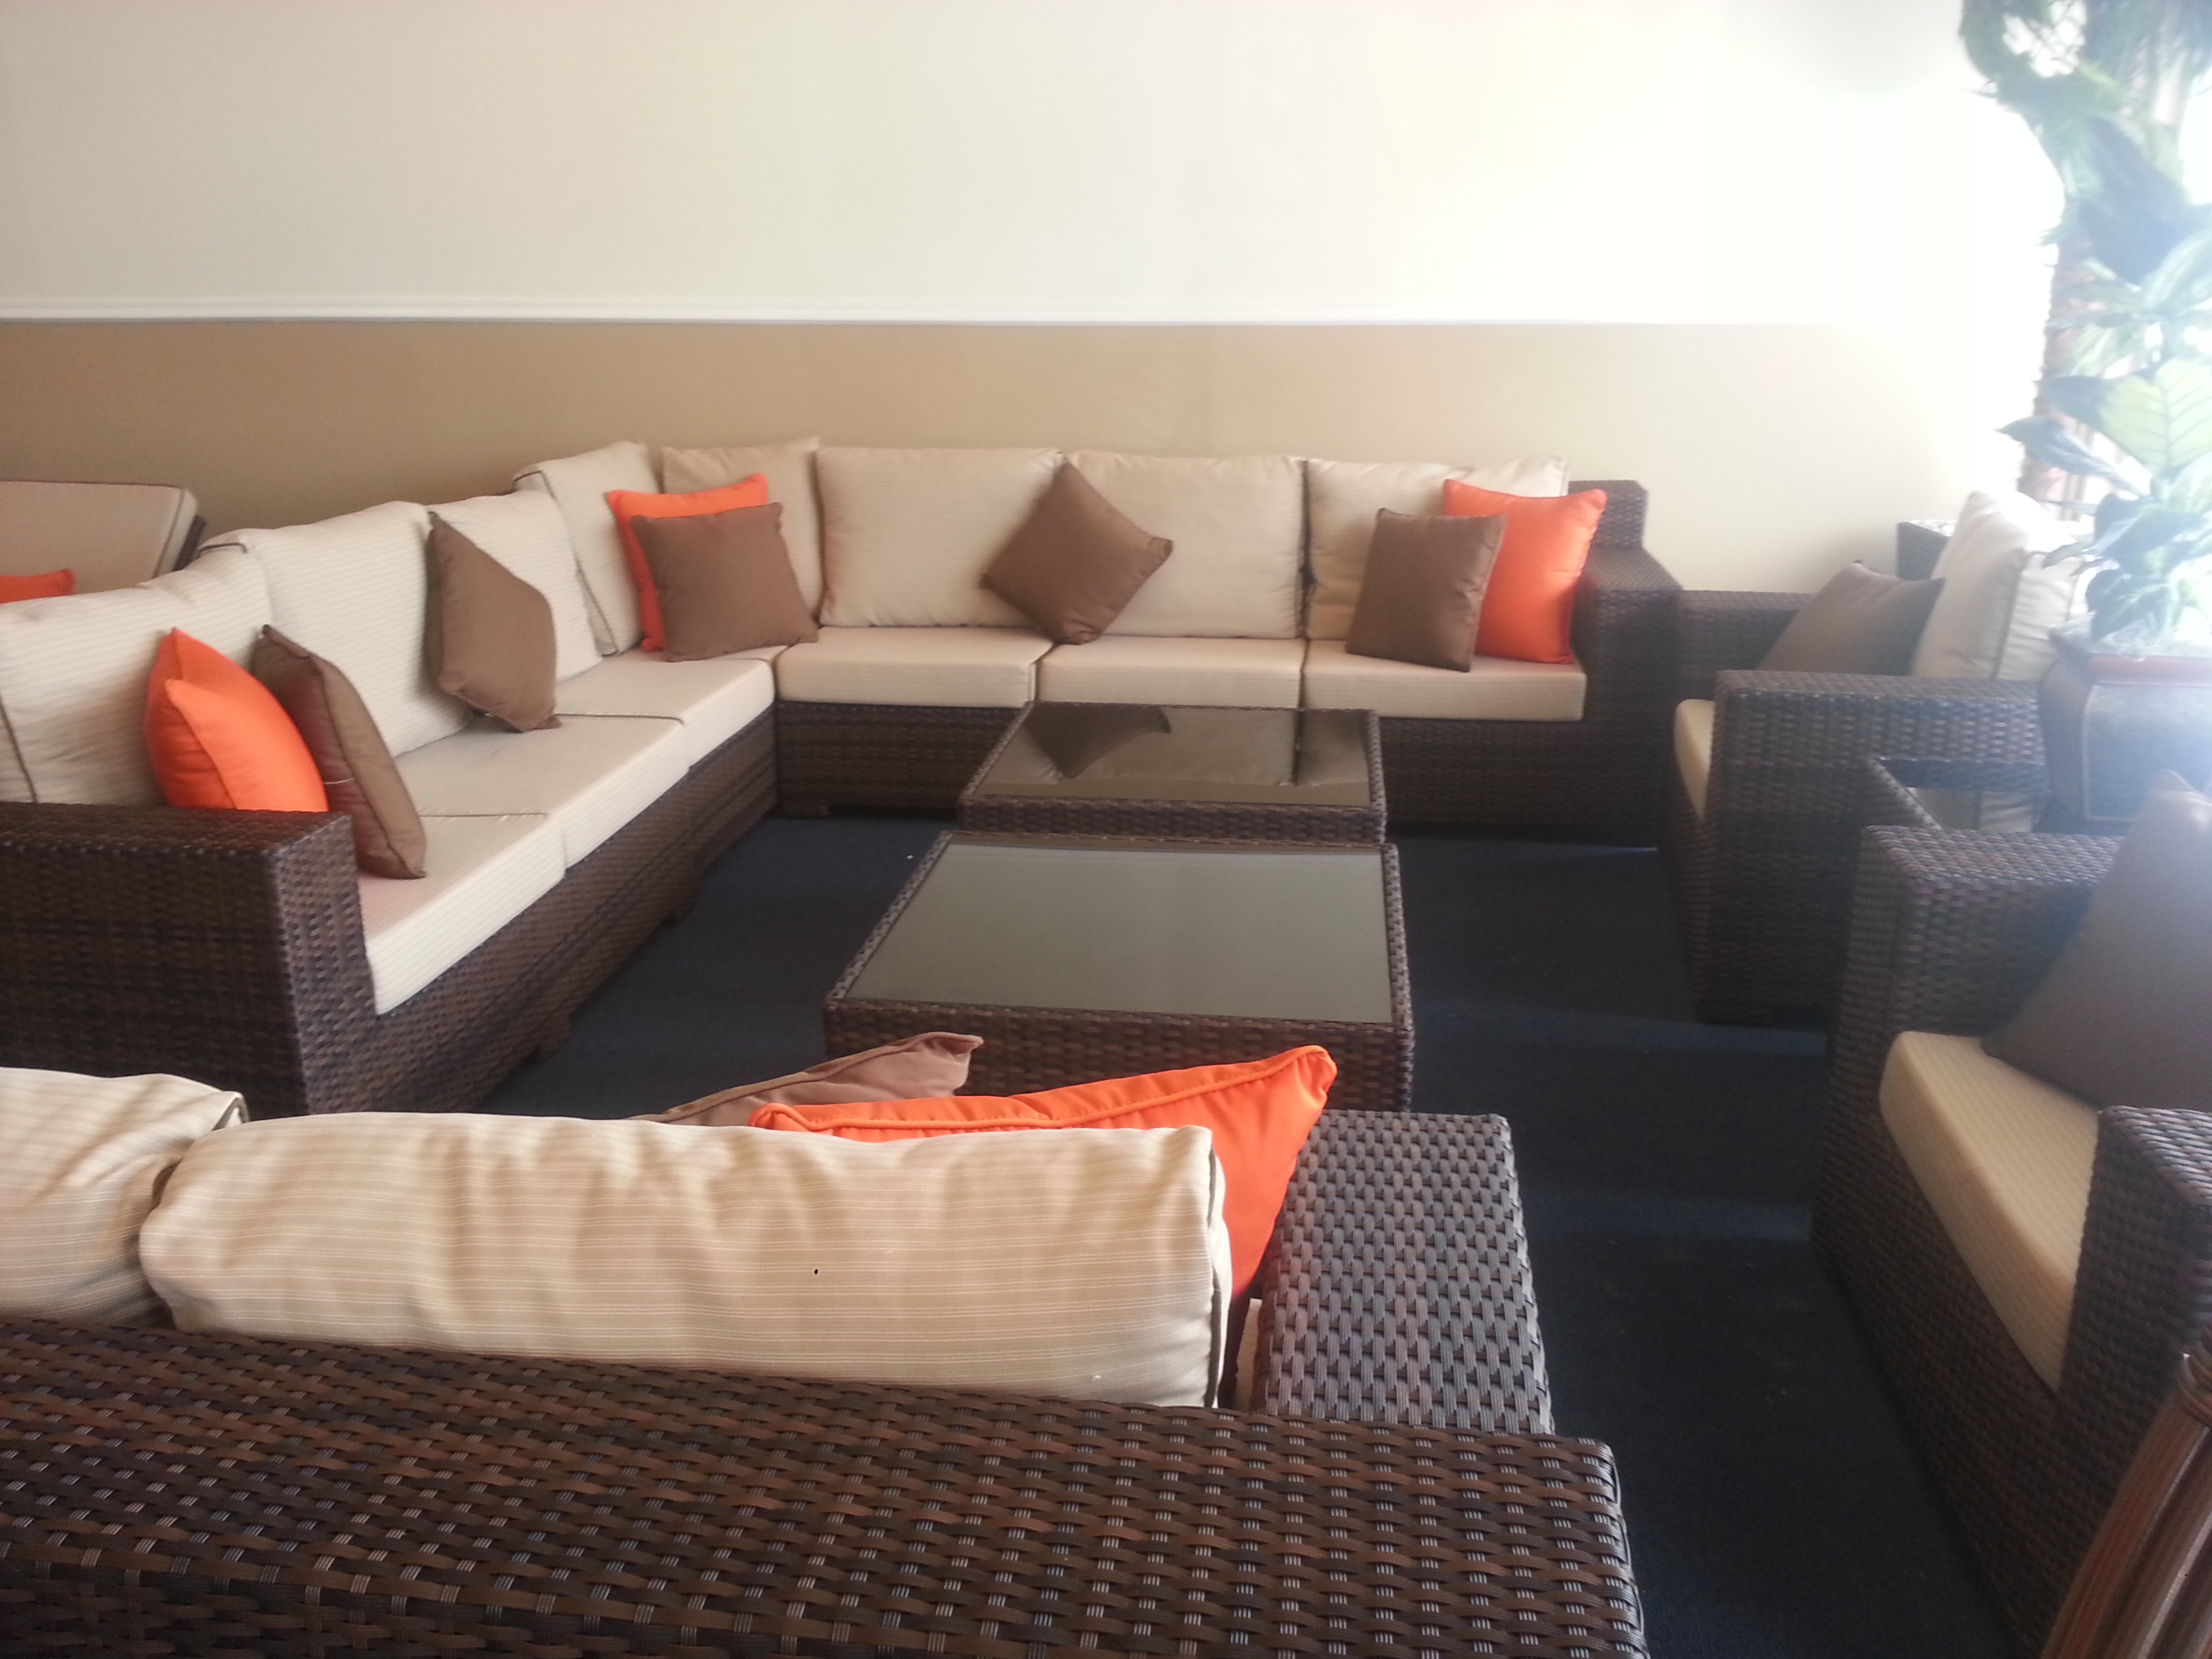 Superb Best Patio Furniture   Outdoor Patio Emporium Corp 311 W 21st St, Hialeah,  FL 33010   YP.com